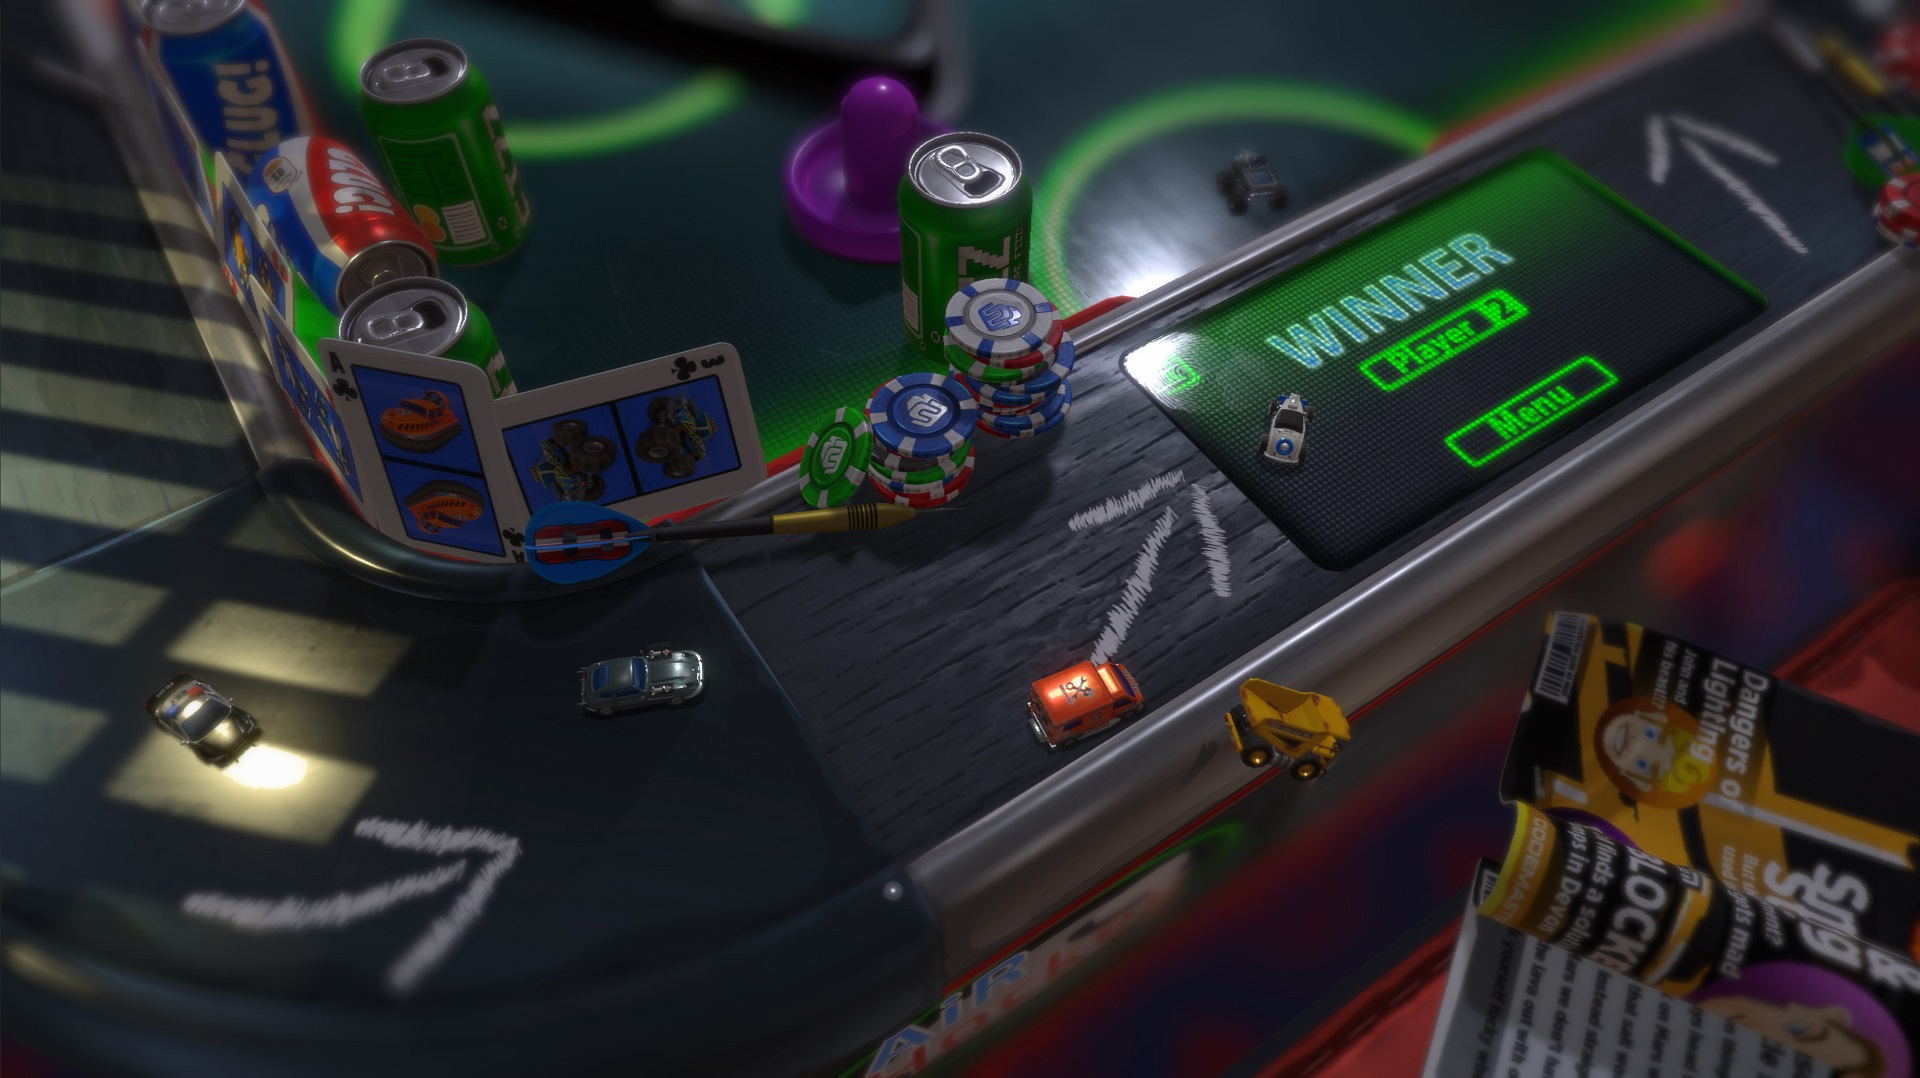 Micro Machines - Cornered into a mistake